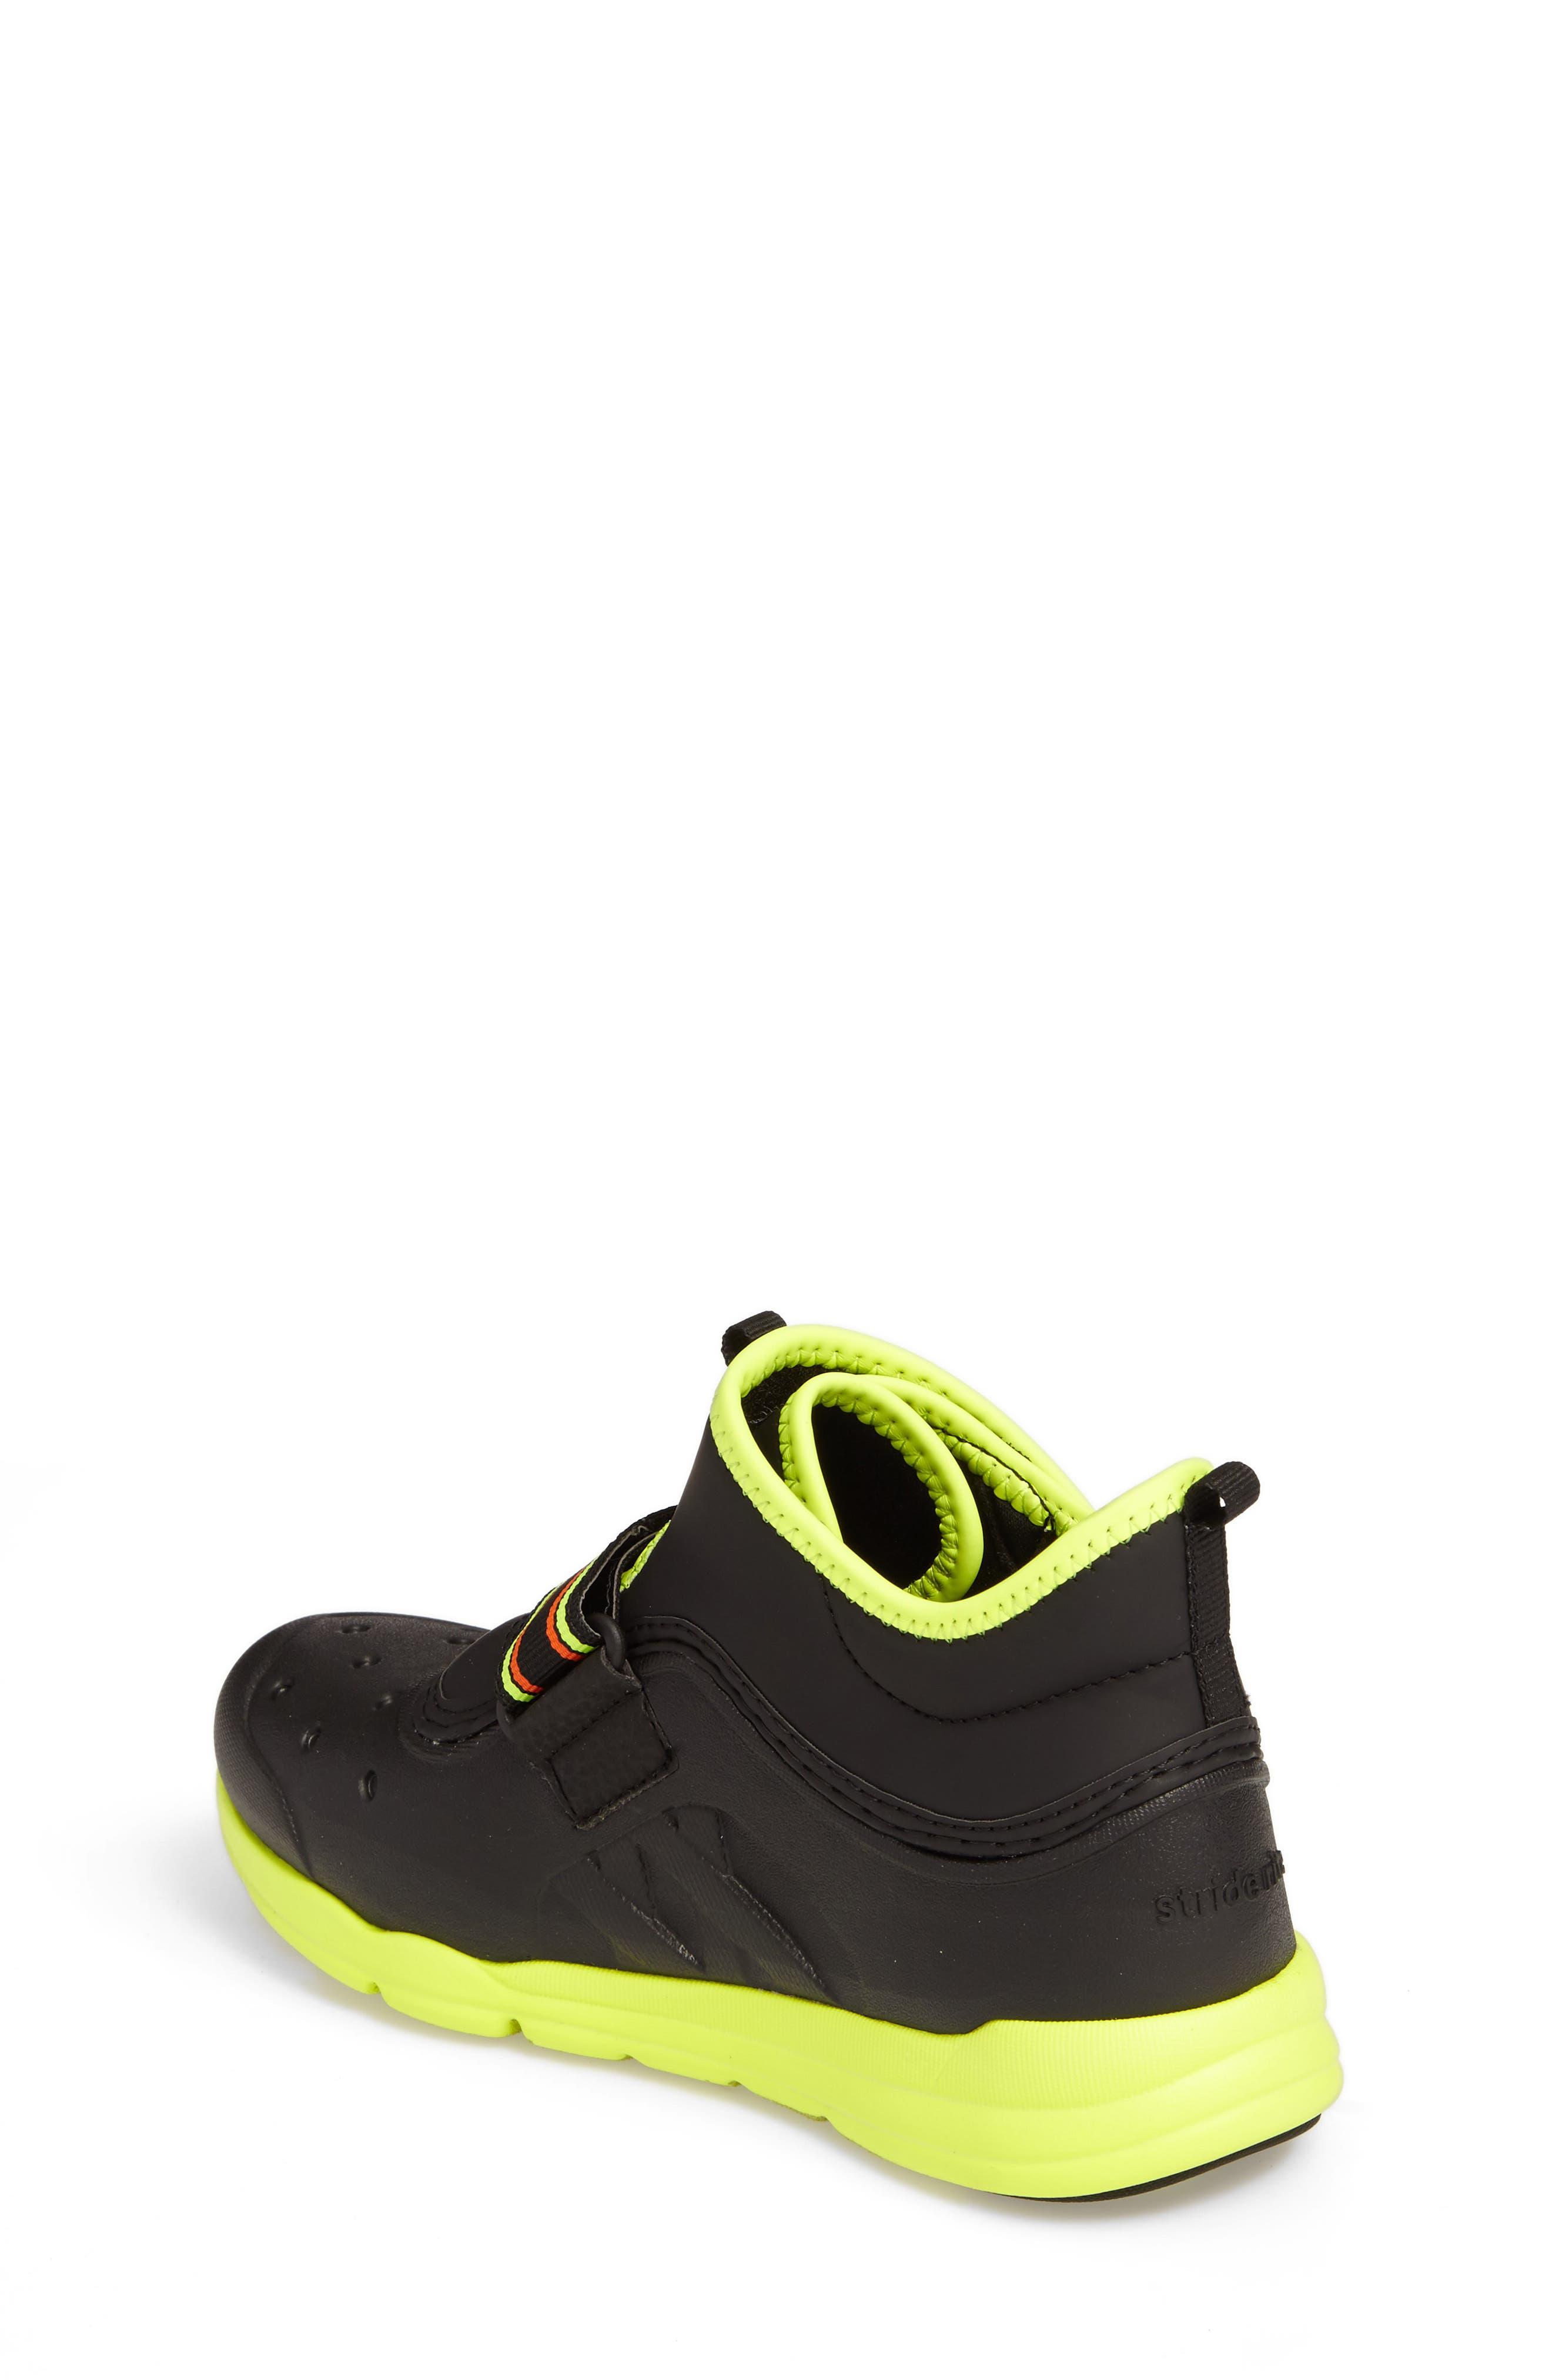 Alternate Image 2  - Stride Rite Made2Play® Phibian Mid Top Sneaker (Baby, Walker & Toddler)